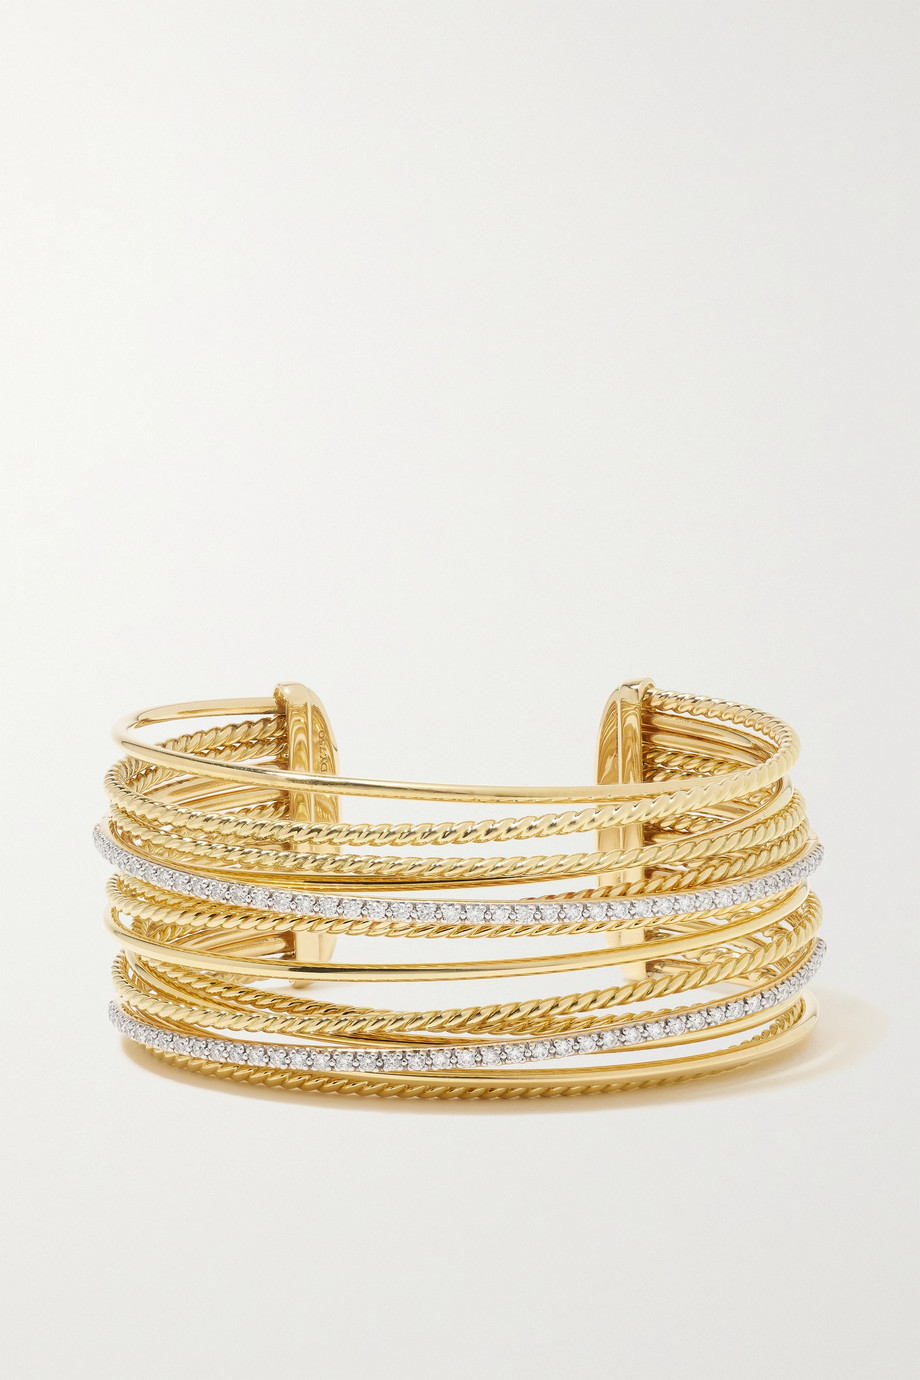 David Yurman Bracelet en or 18 carats et diamants Crossover